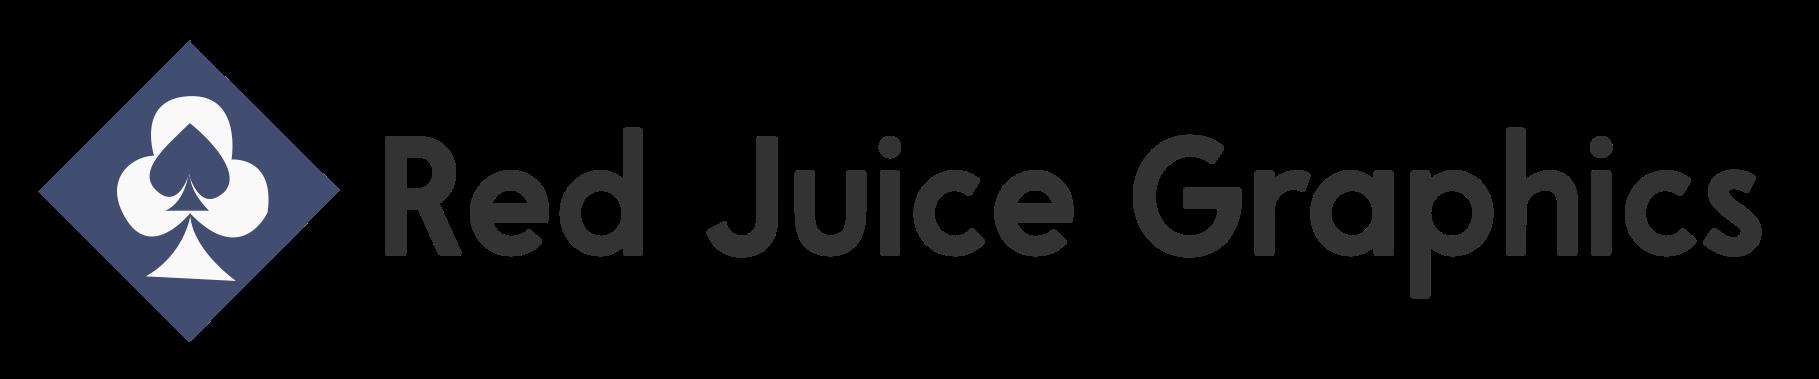 Red Juice Graphics